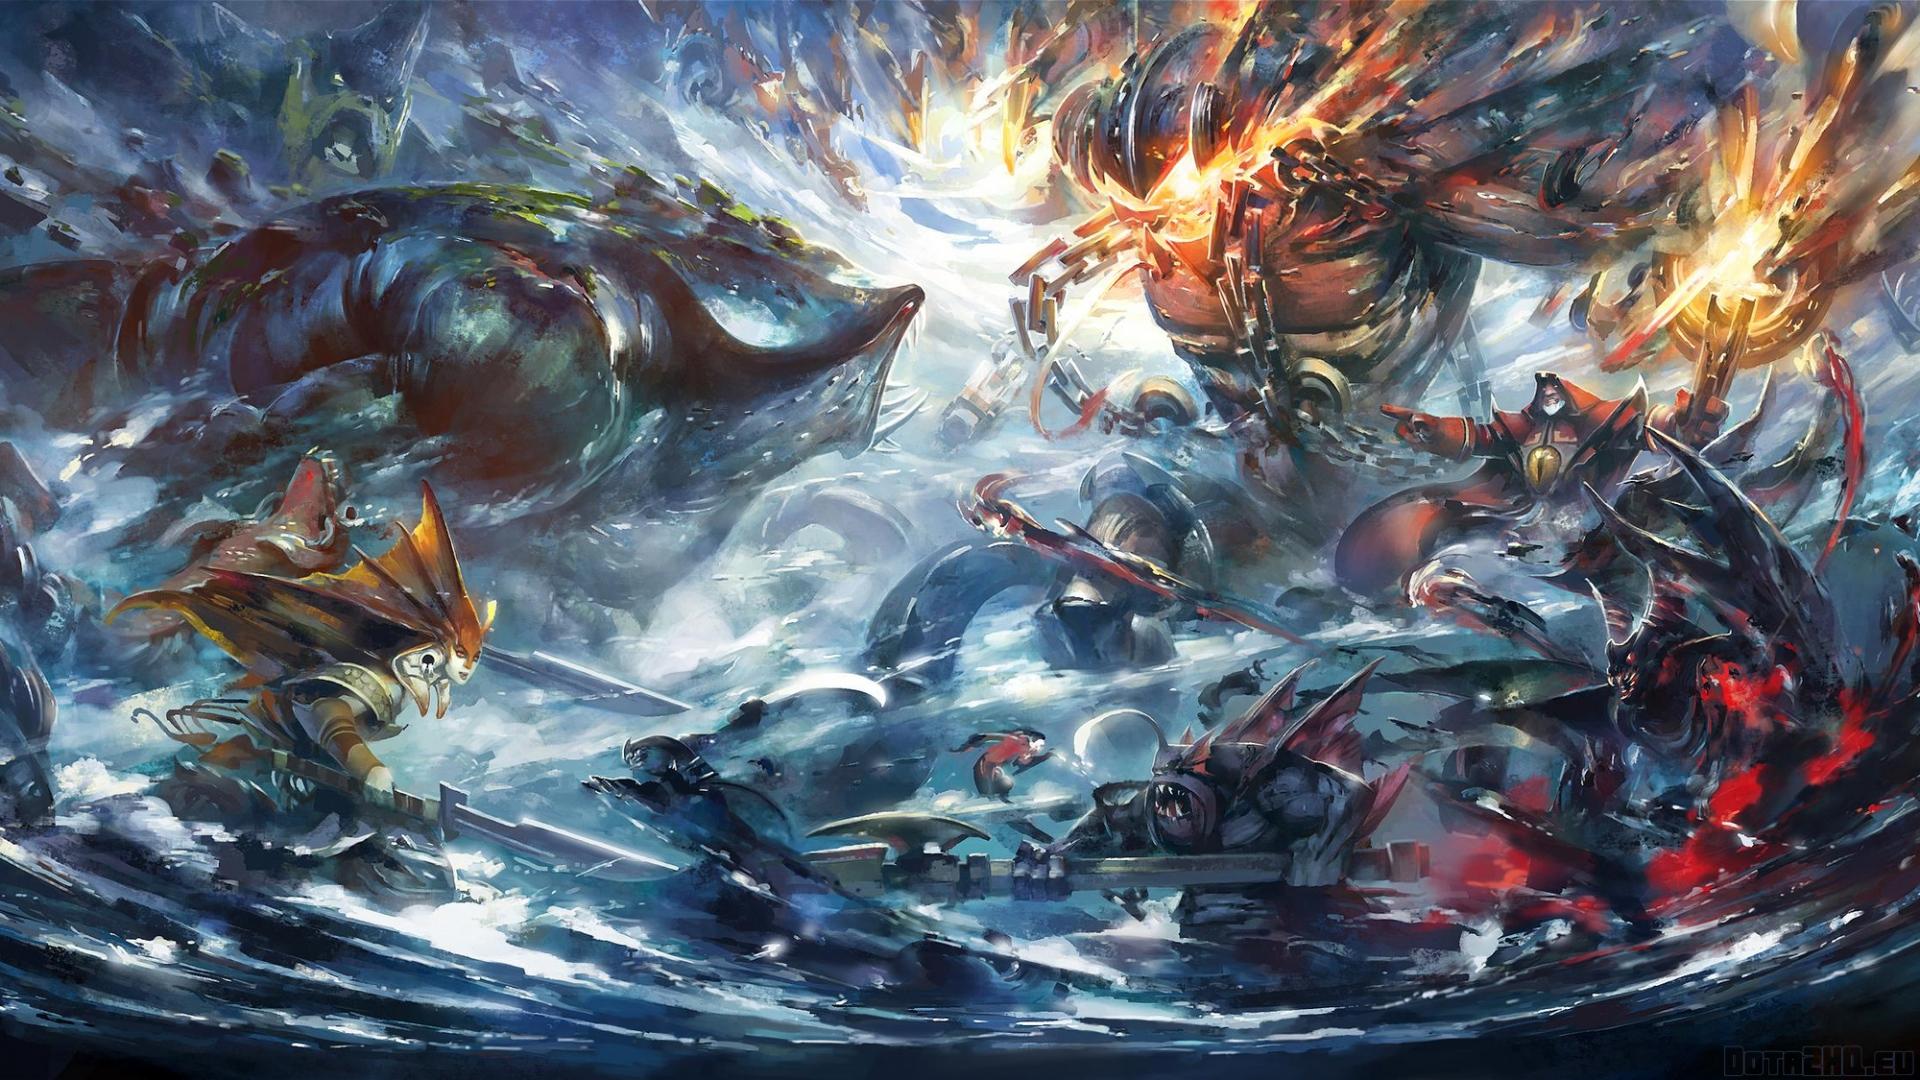 Download Wallpaper 1920x1080 Dota 2 Epic battle Art Full HD 1080p HD 1920x1080